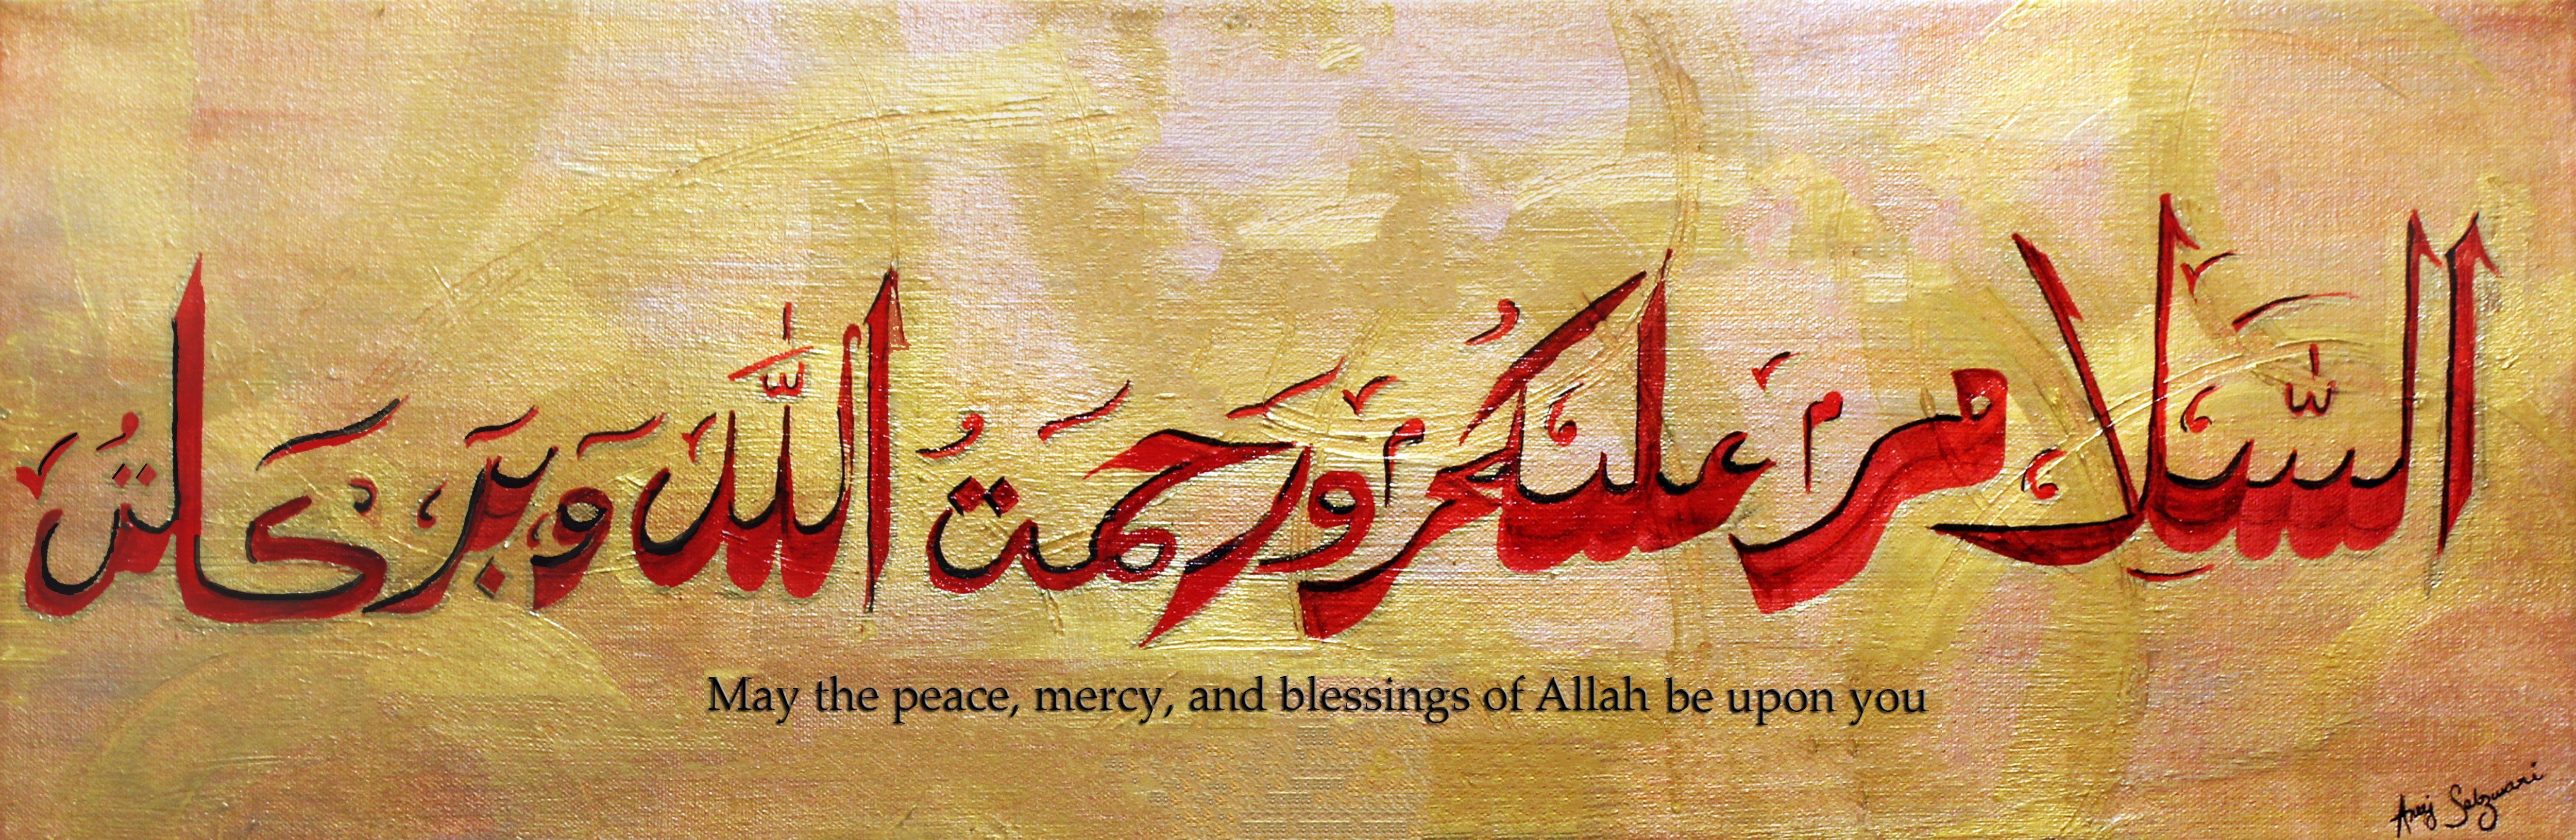 The Muslim Greeting Assalamu Alaikum Wa Rahmatullahi Wa Barakatuh